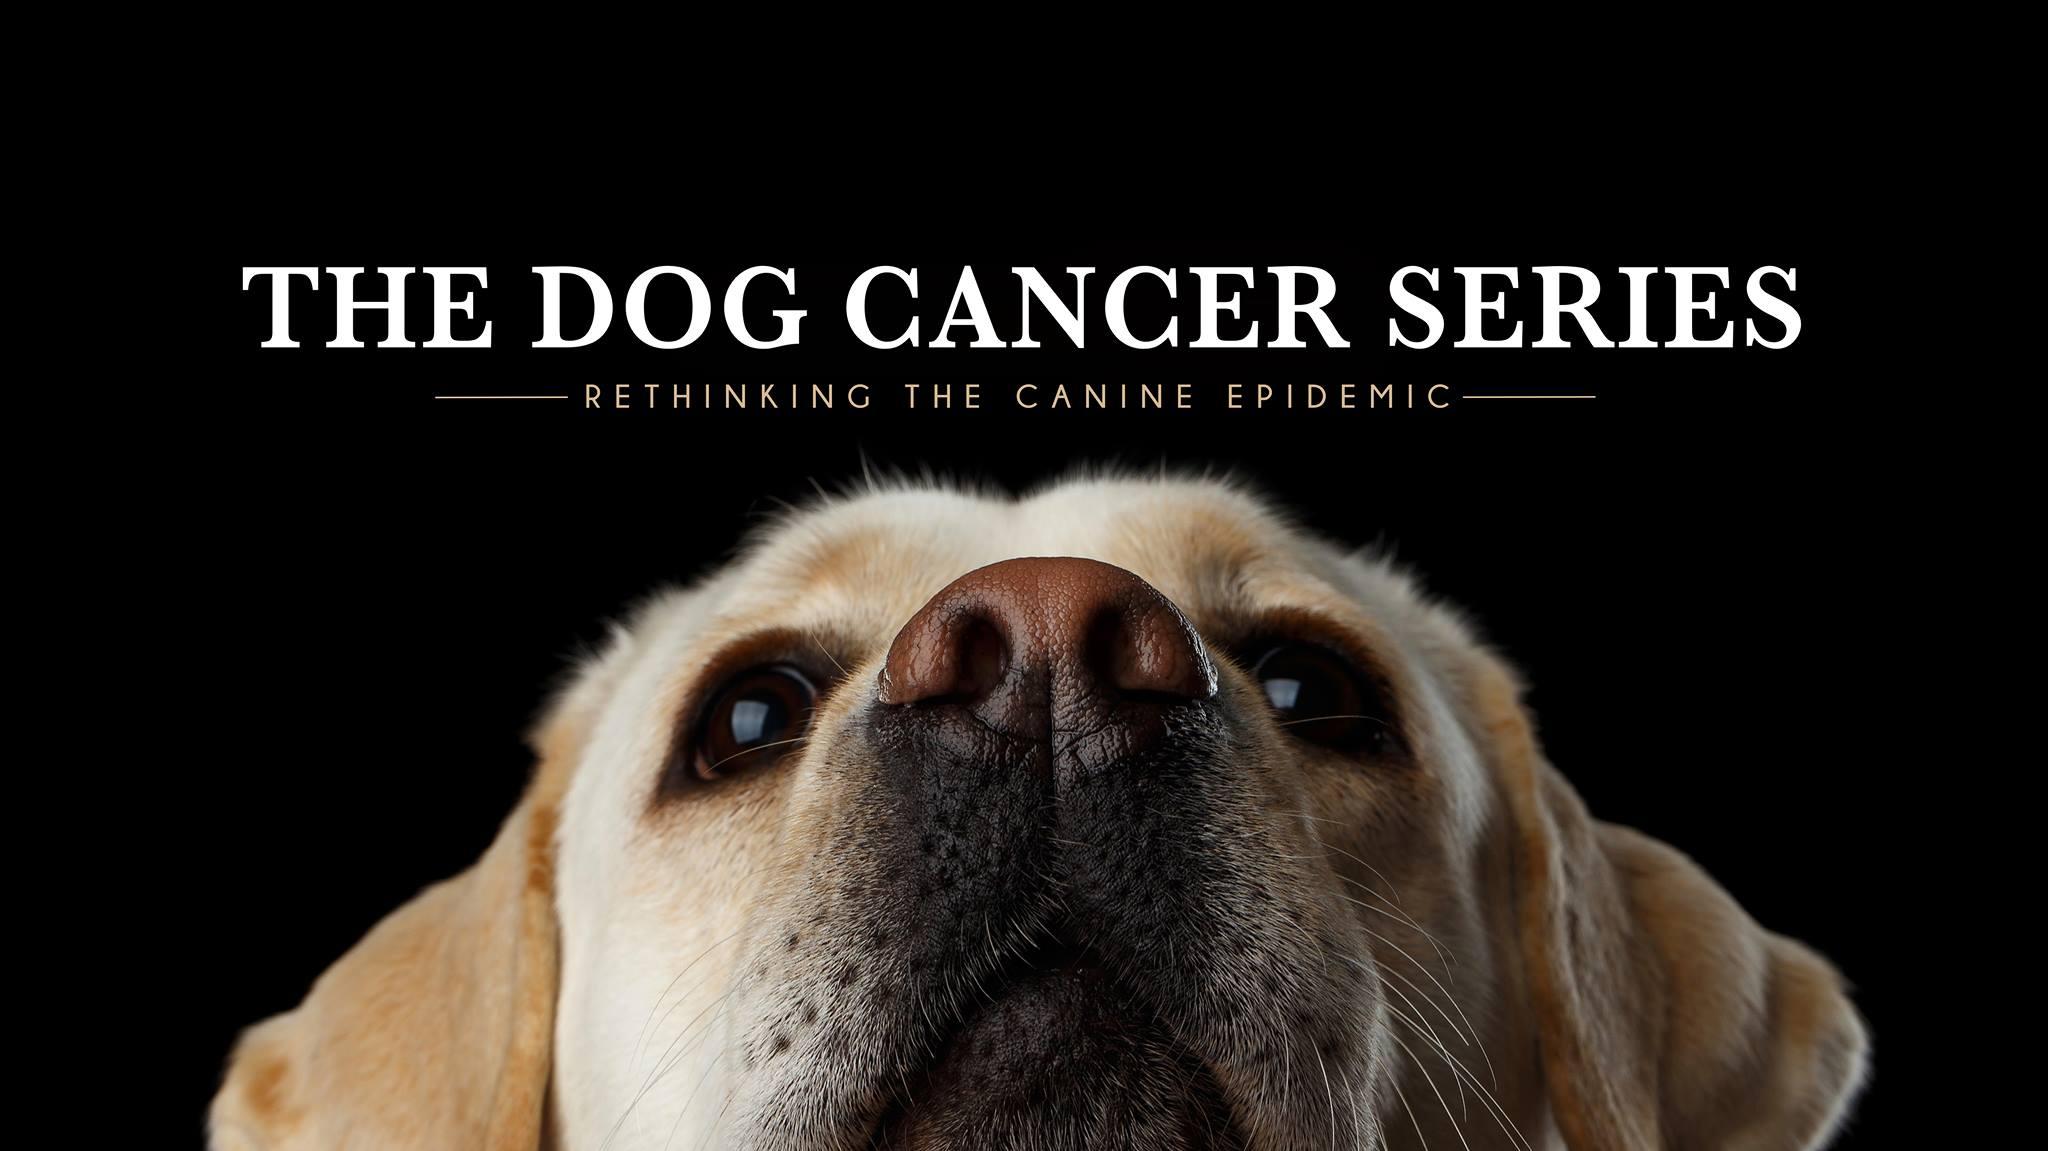 dogcancerseries